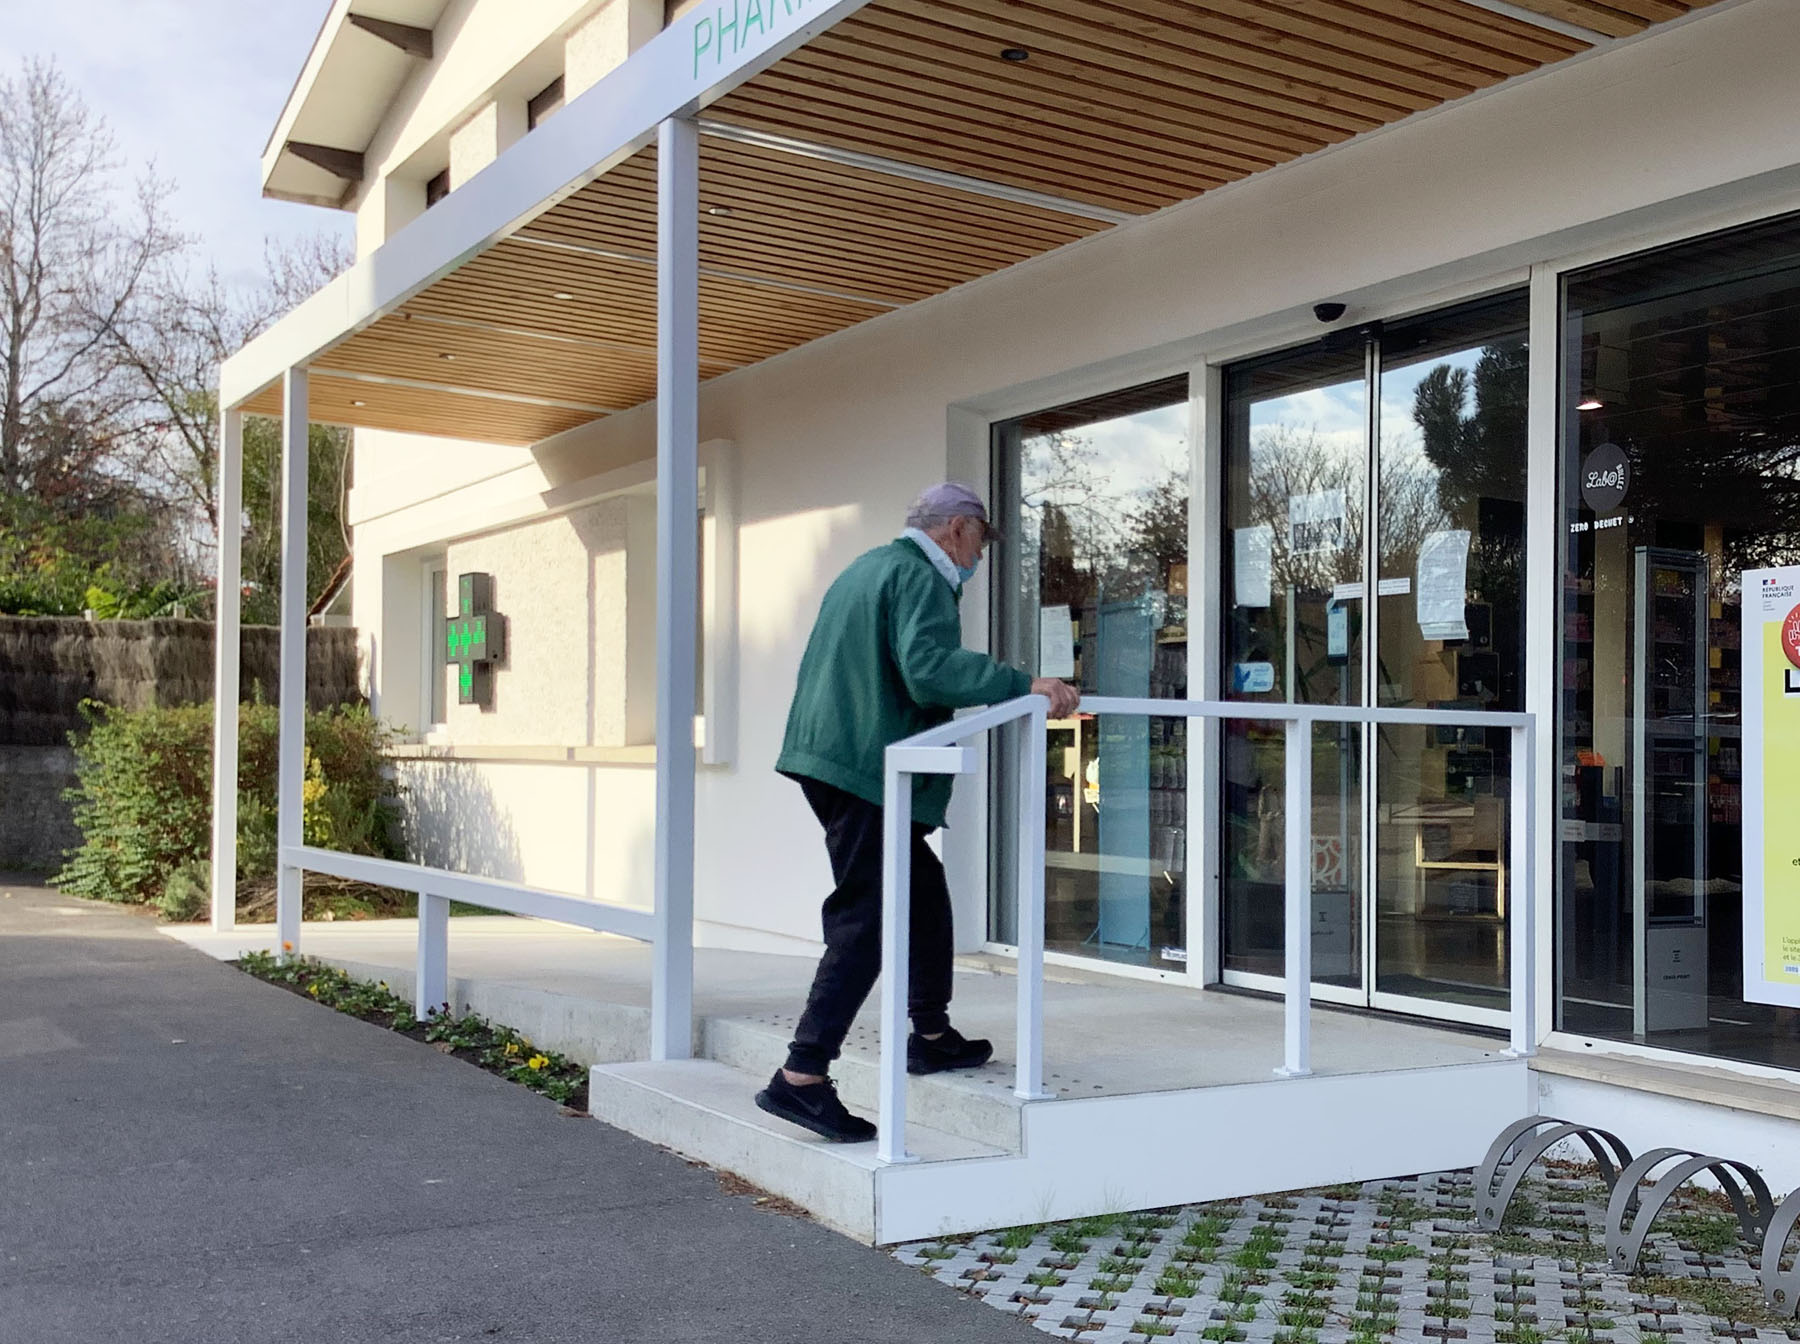 auvent pharmacie sebastien gueniot felaa architectes